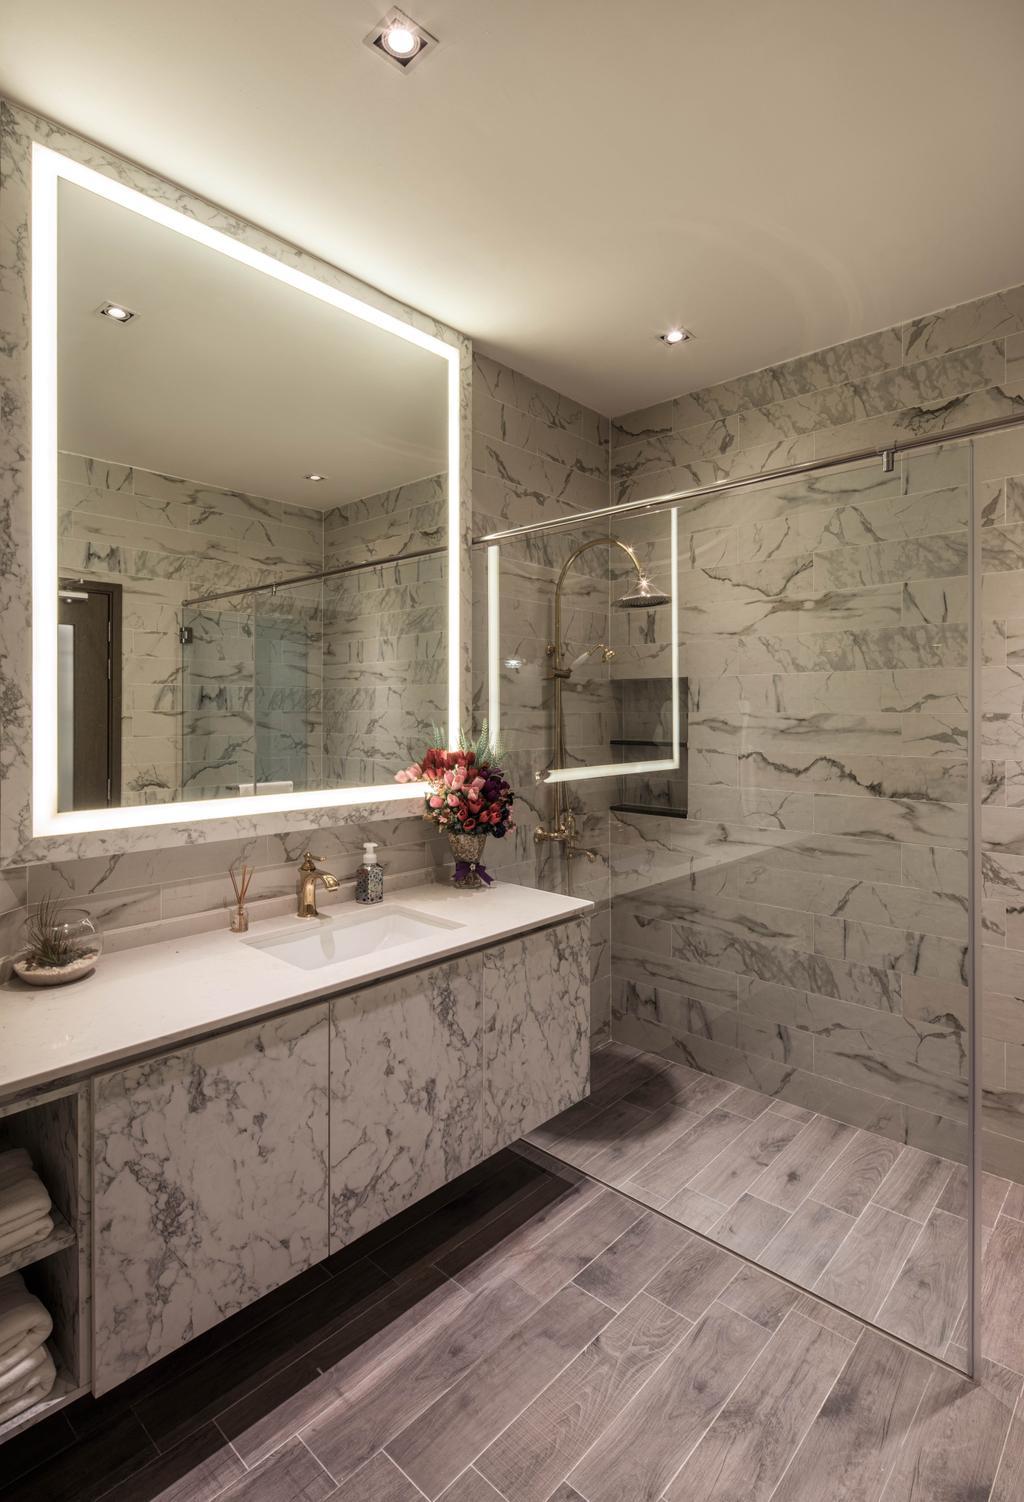 37 Jalan Pemimpin, Commercial, Interior Designer, Zenith Arc, Modern, Bathroom, Indoors, Interior Design, Room